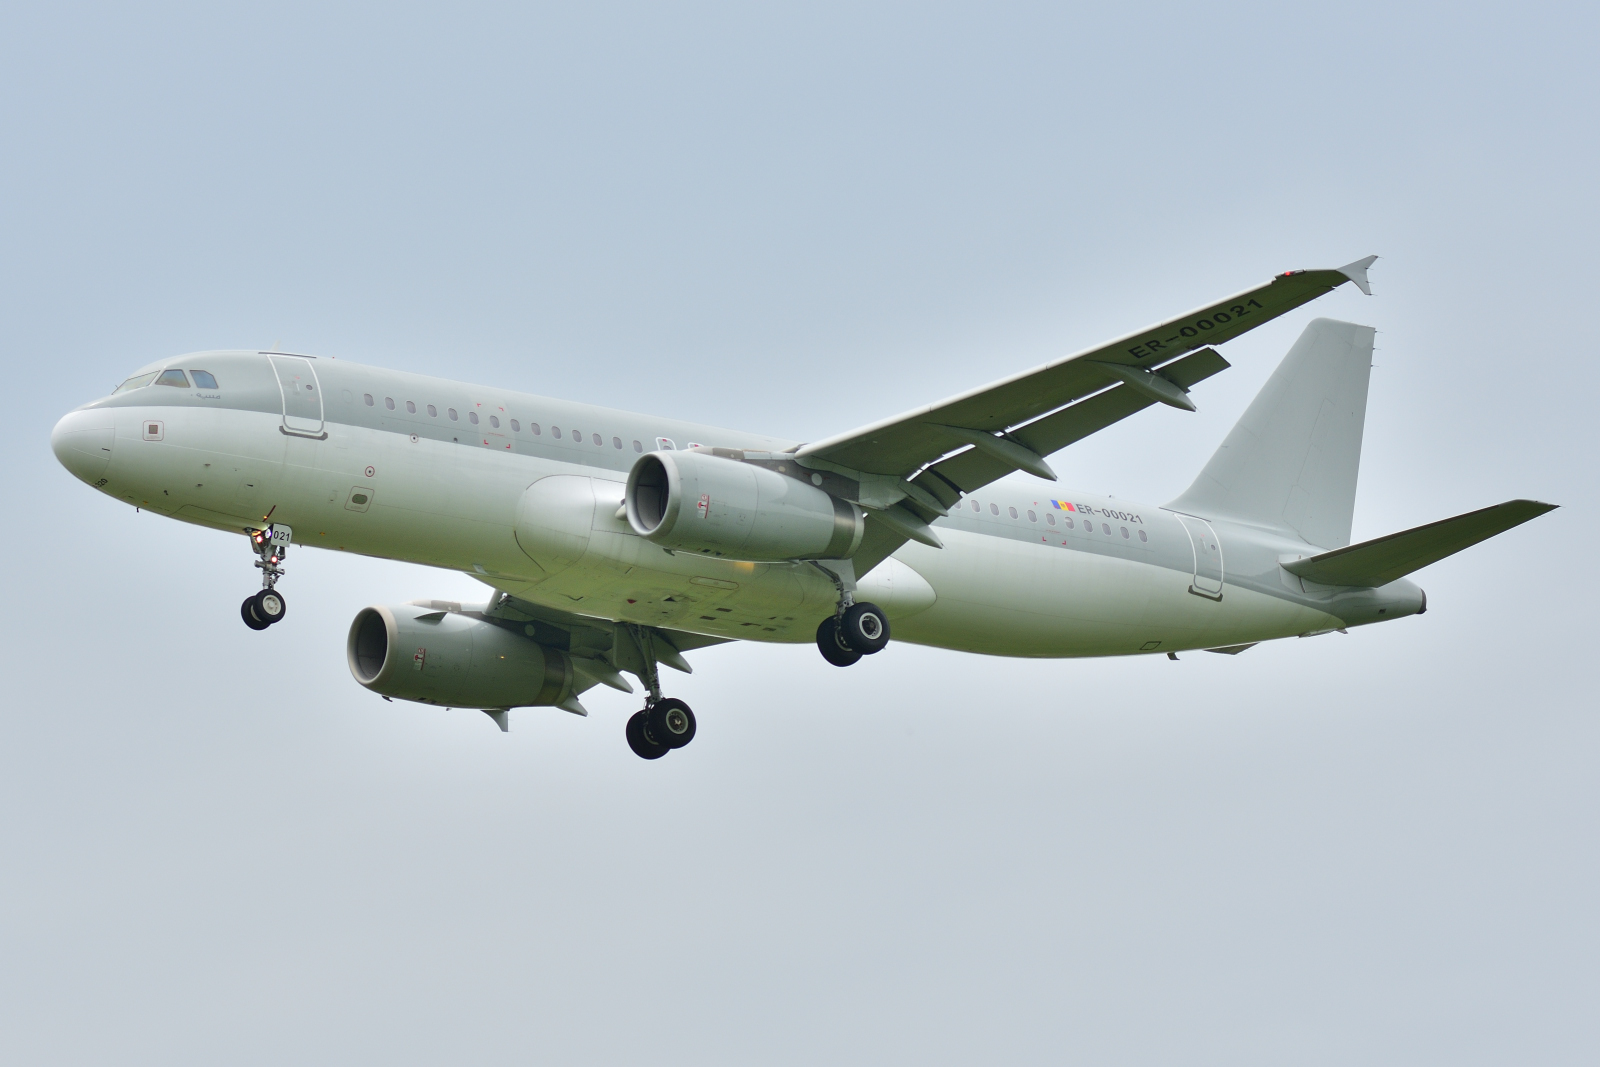 Airbus A320, ER-00021